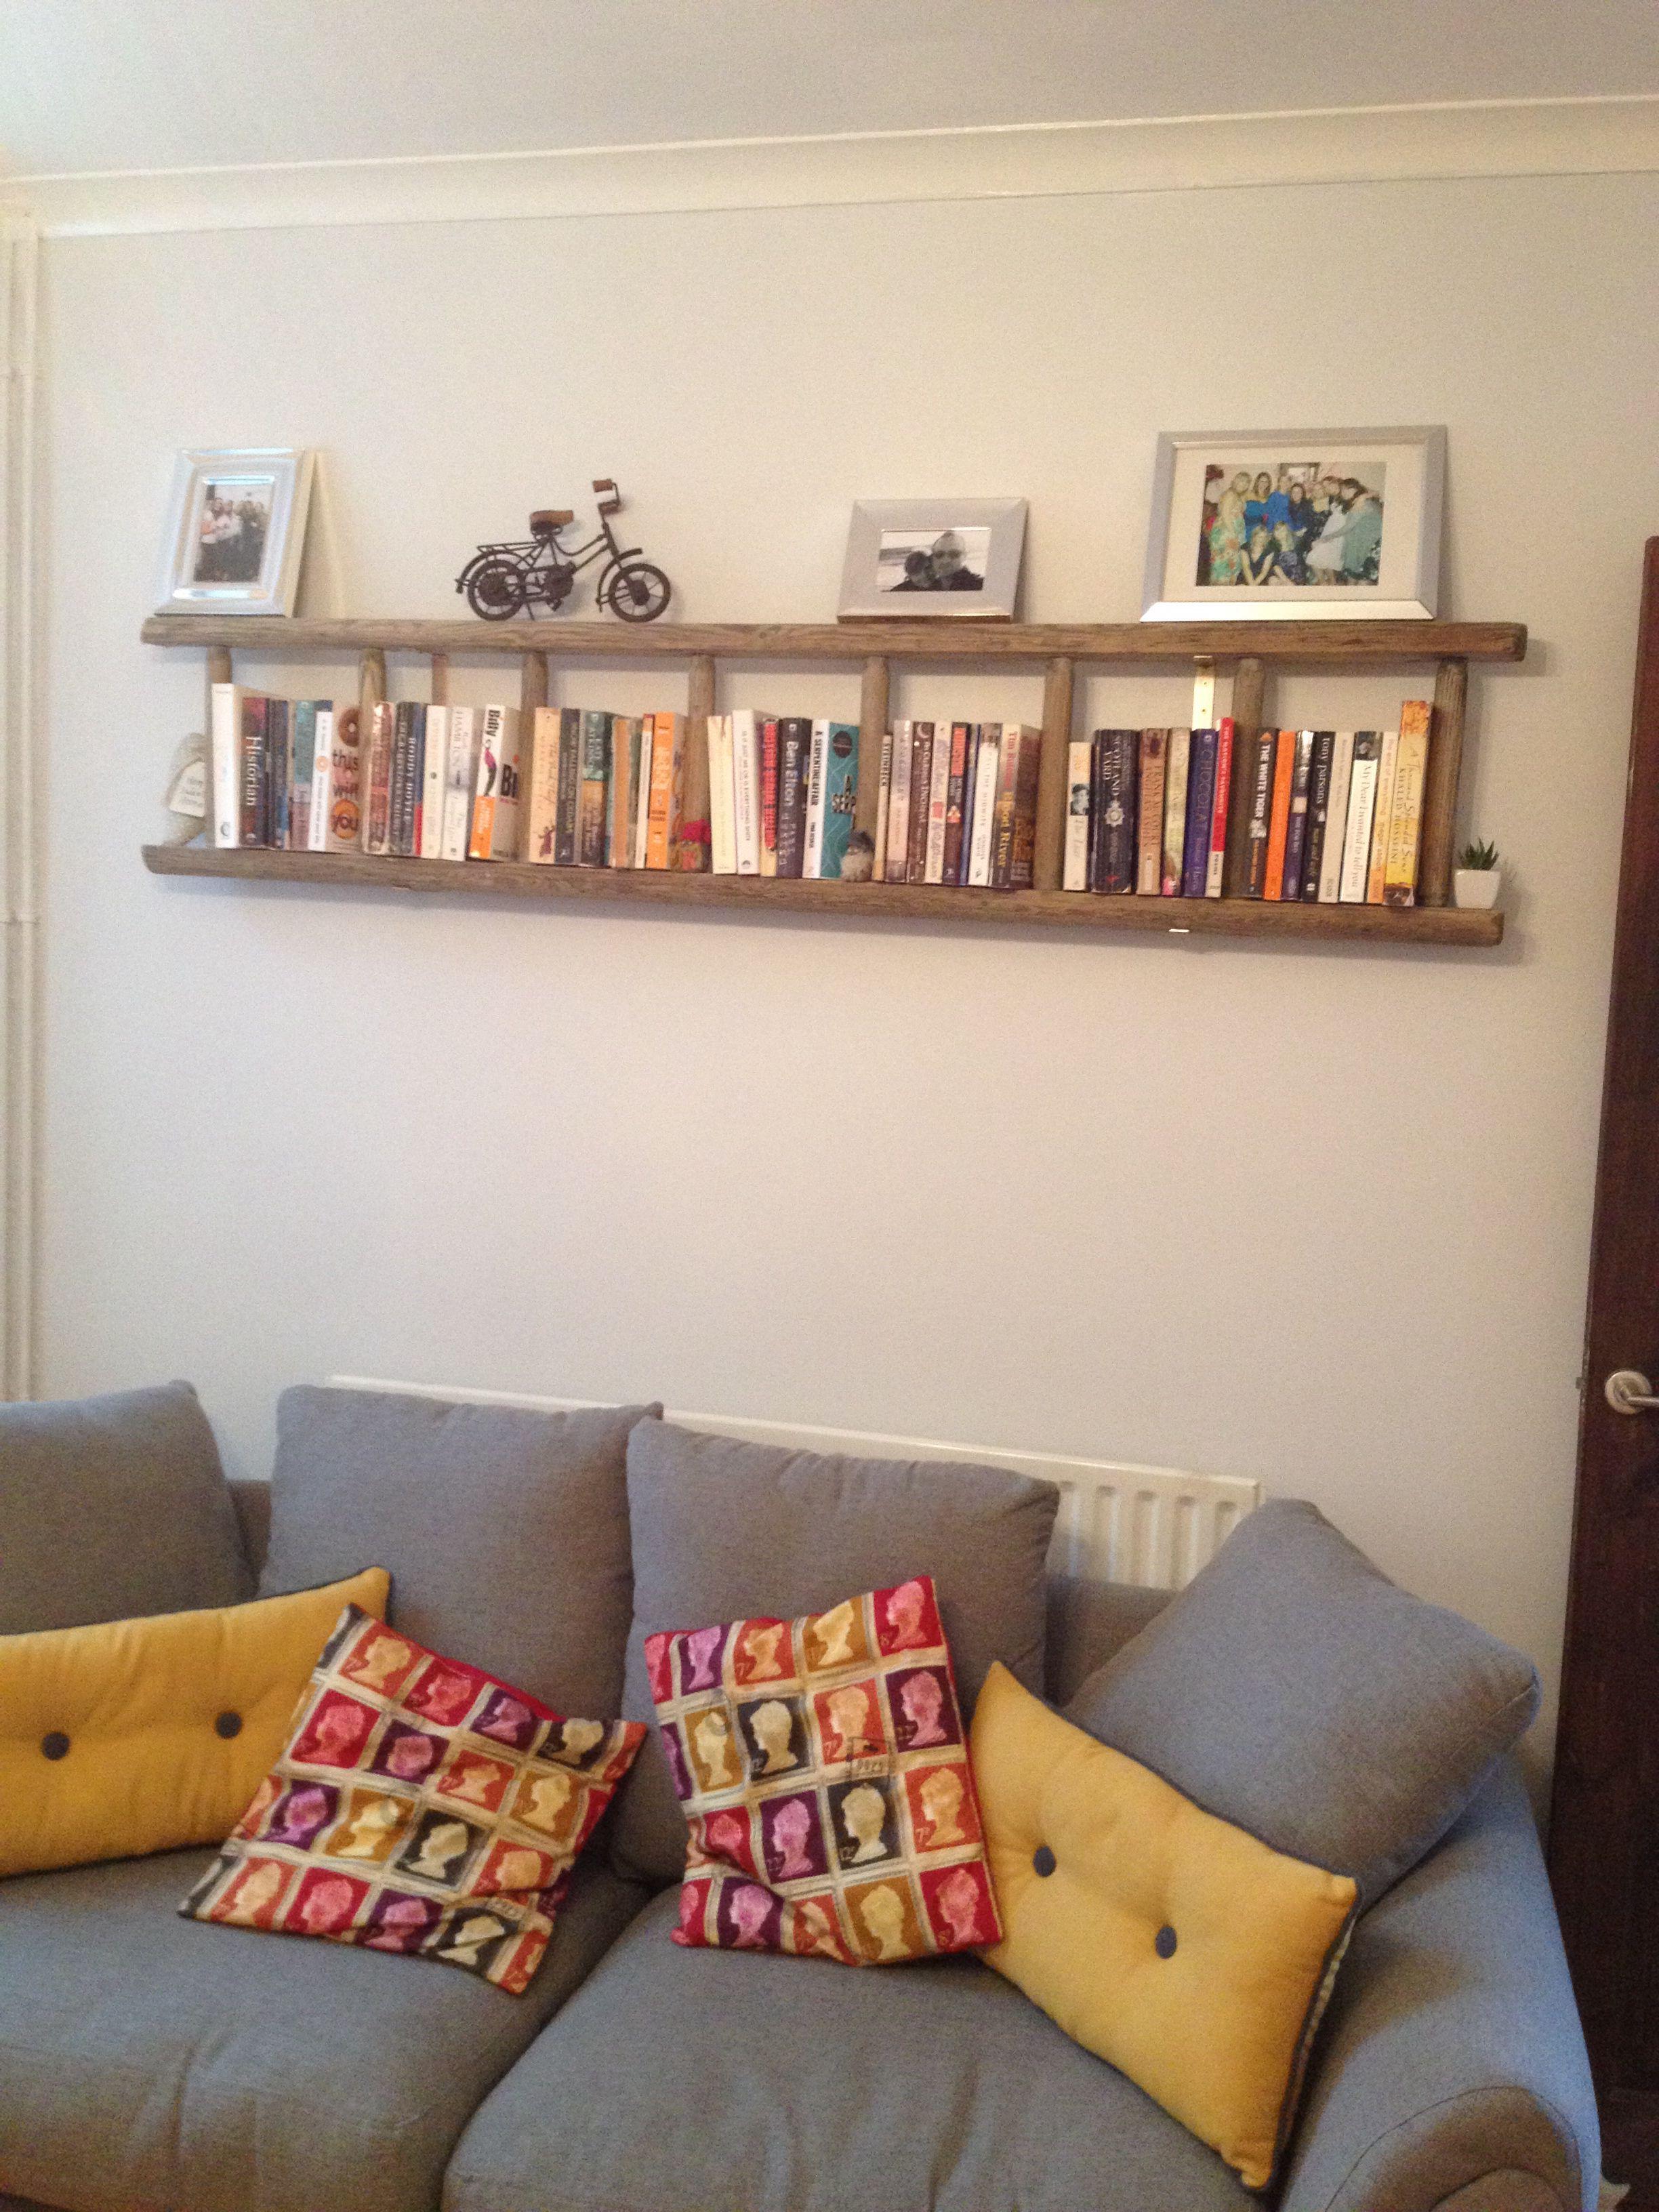 Vintage ladder bookcase walls and art arrangements in